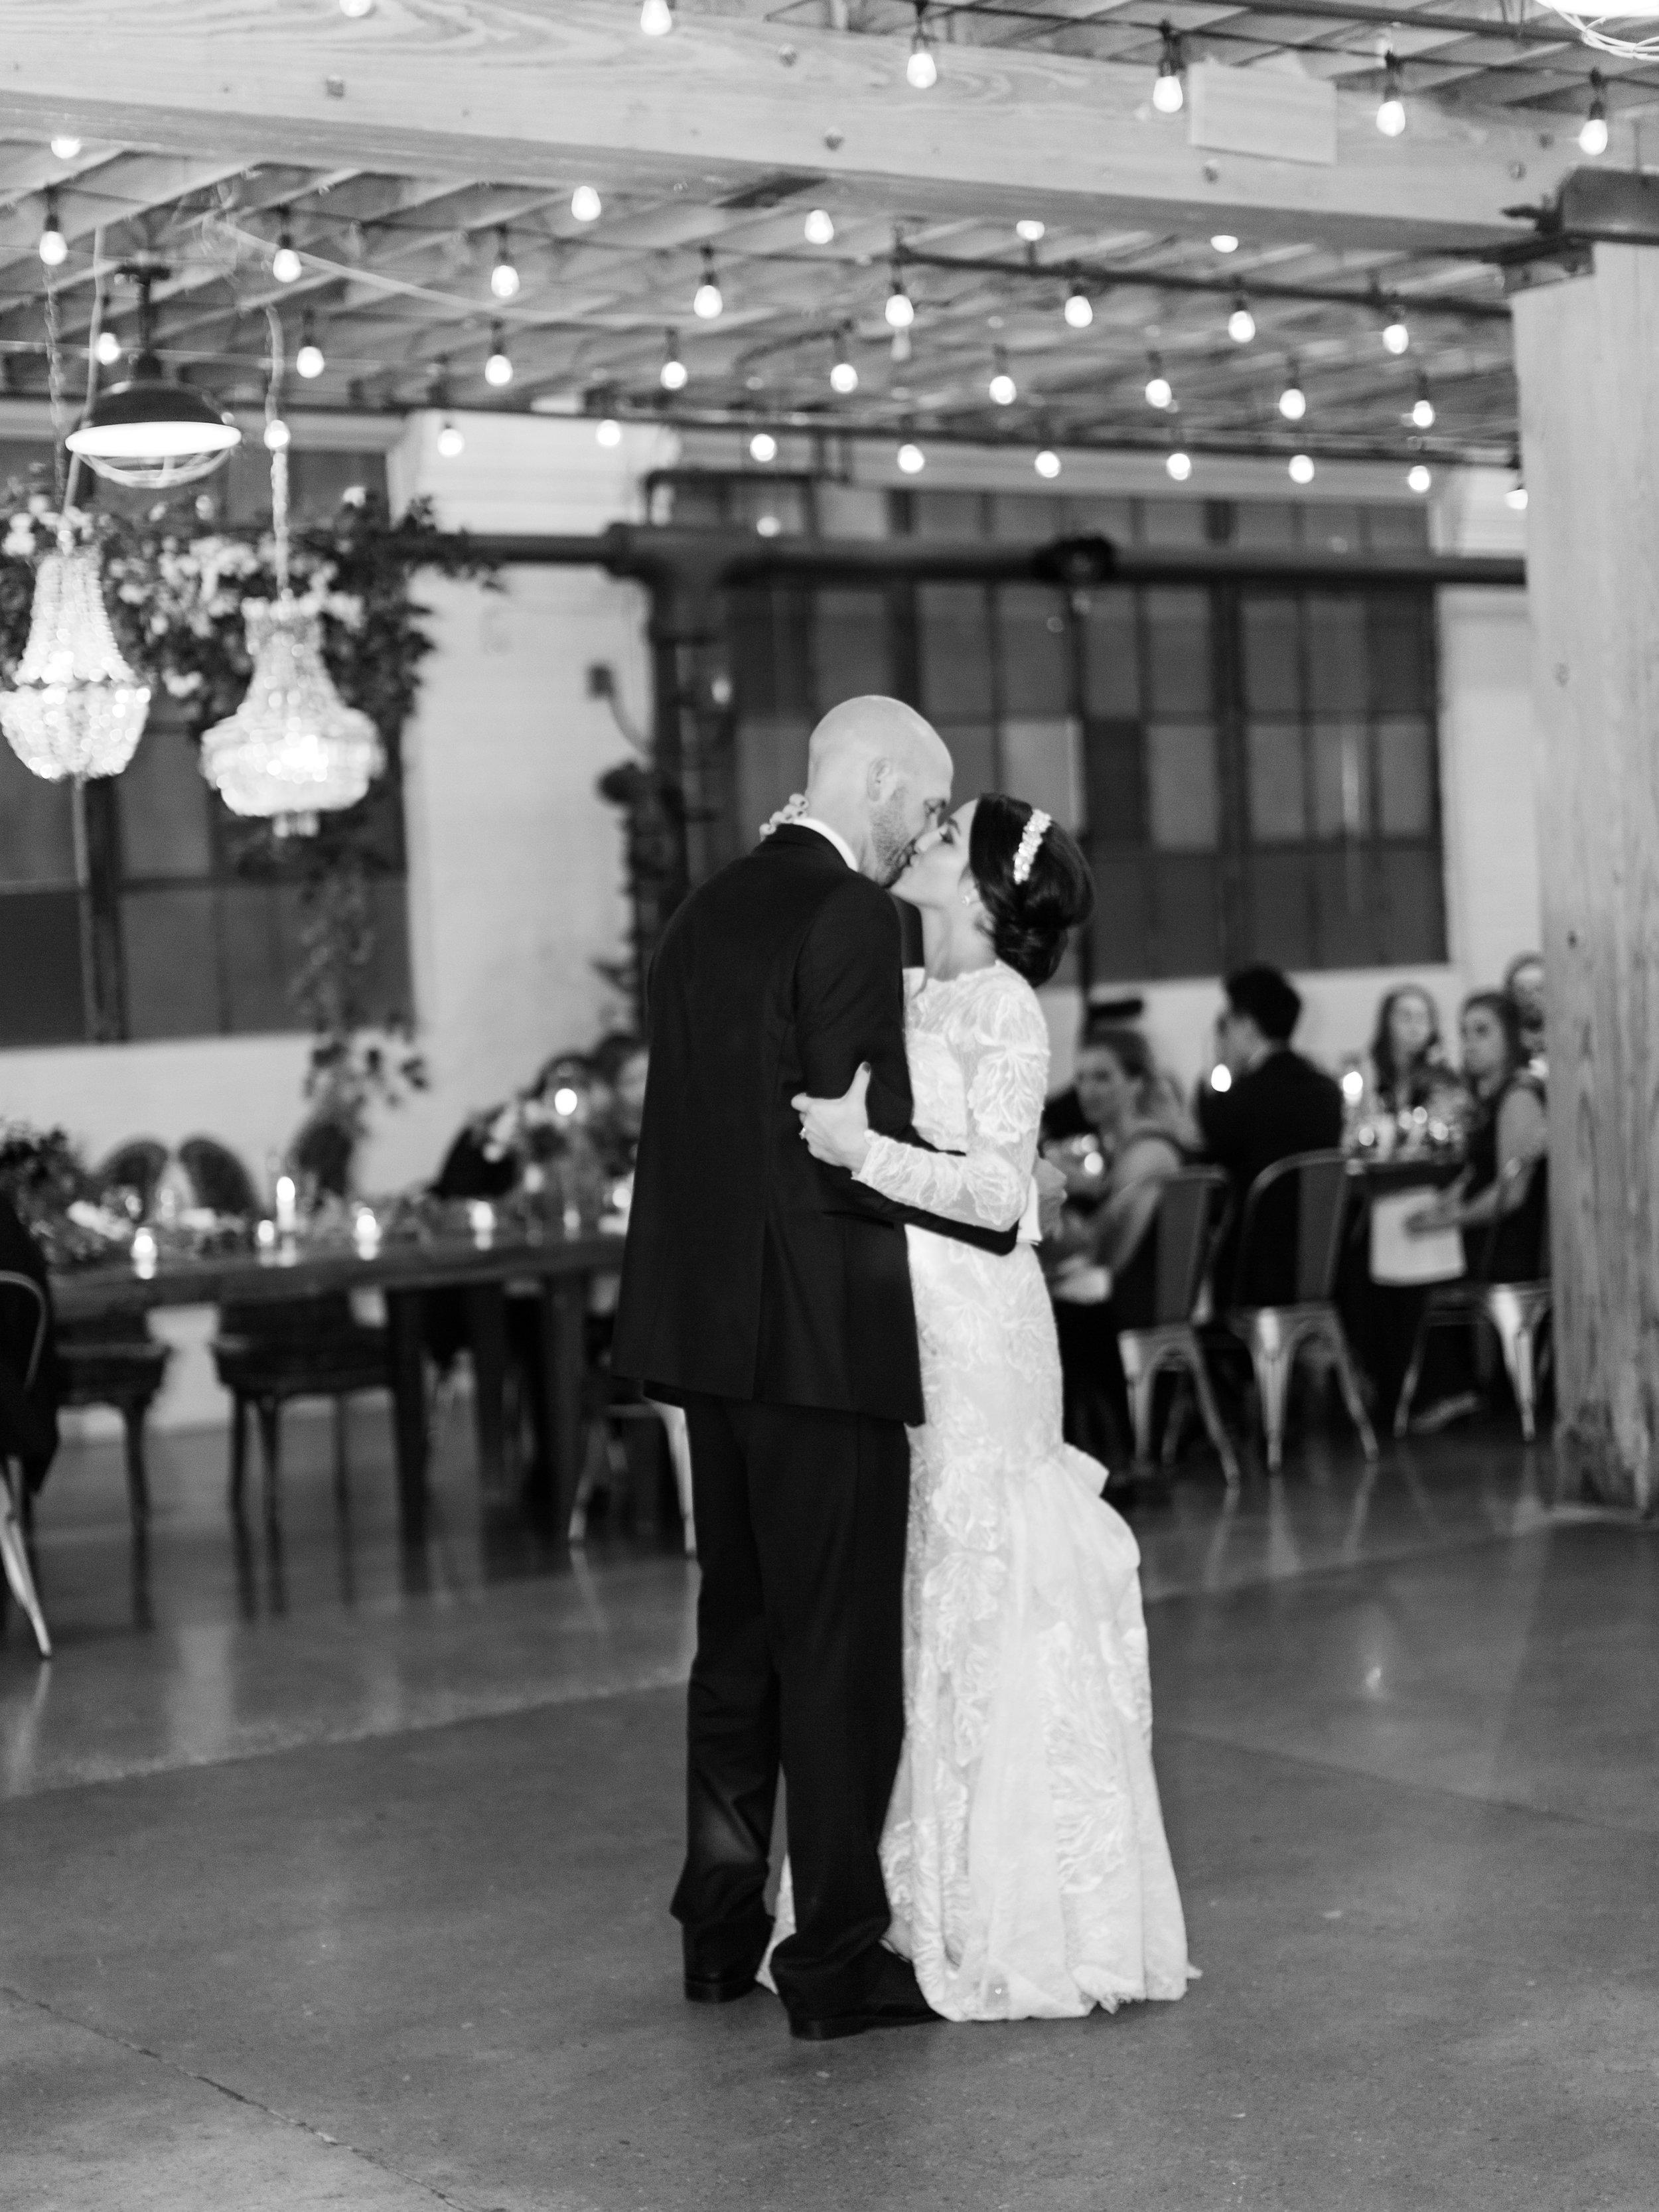 Vogelzang+Wedding+Reception+Dancing-1.jpg